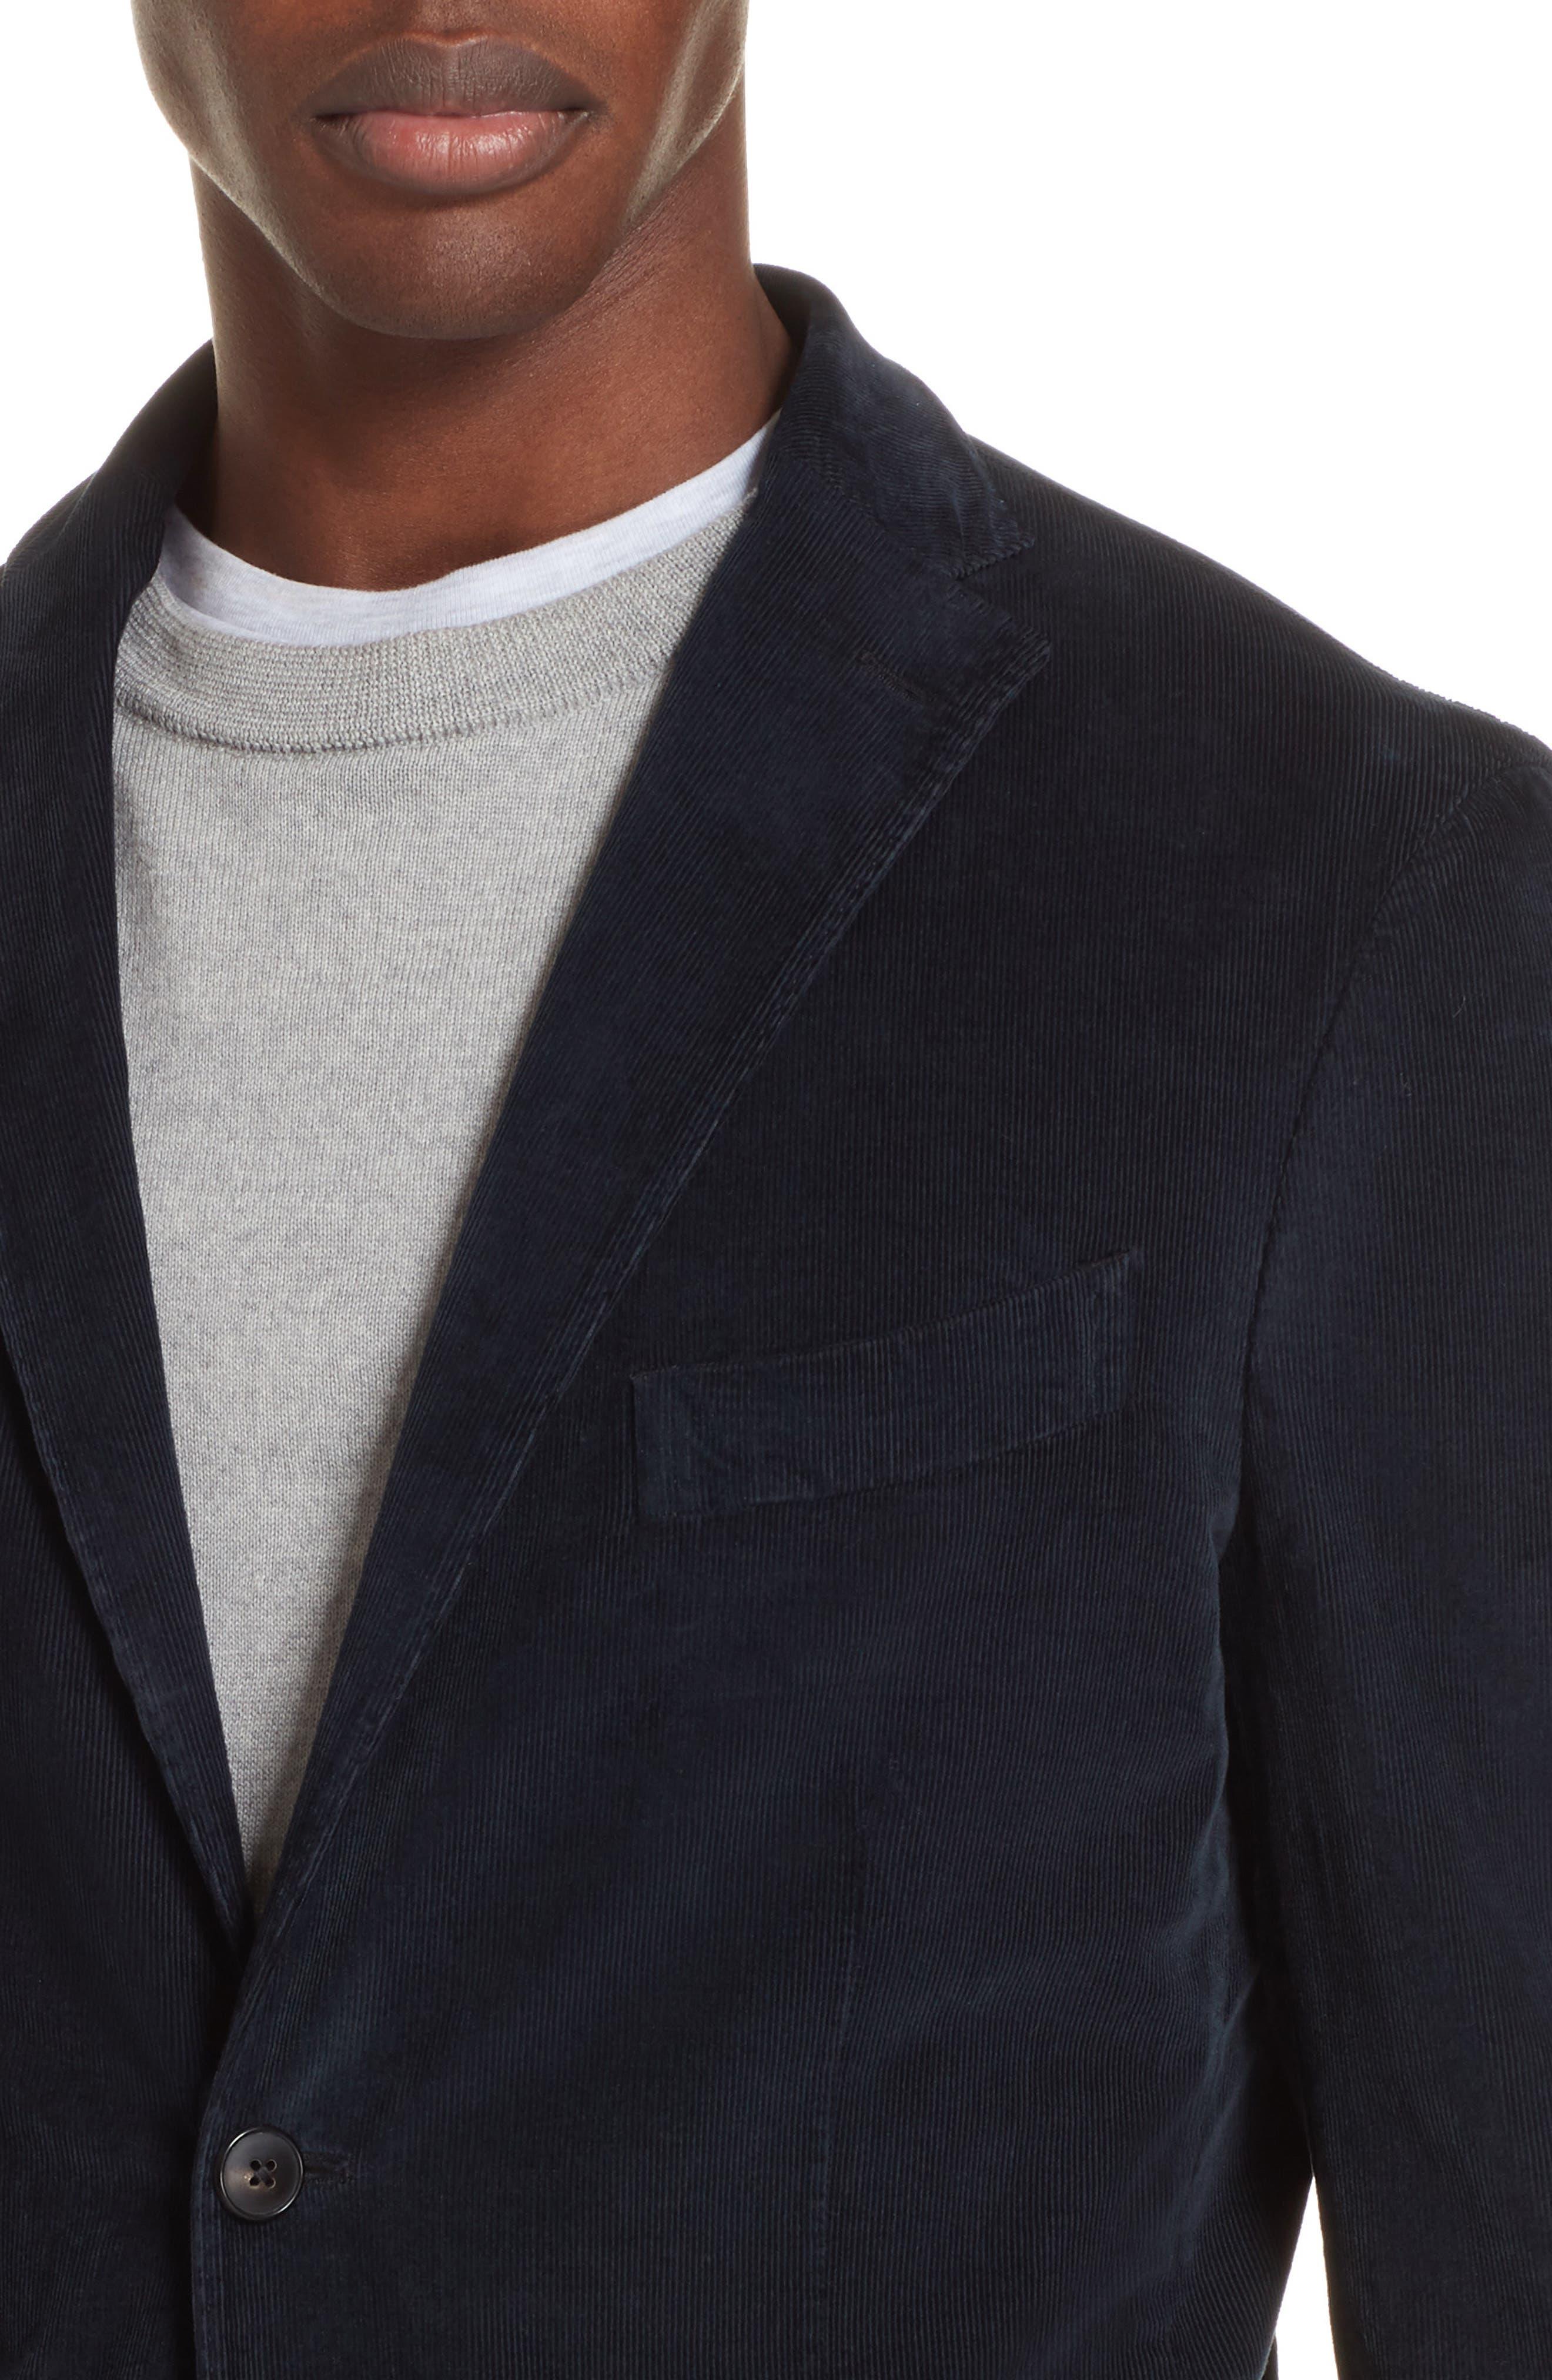 Trim Fit Stretch Corduroy Cotton Blazer,                             Alternate thumbnail 4, color,                             NAVY